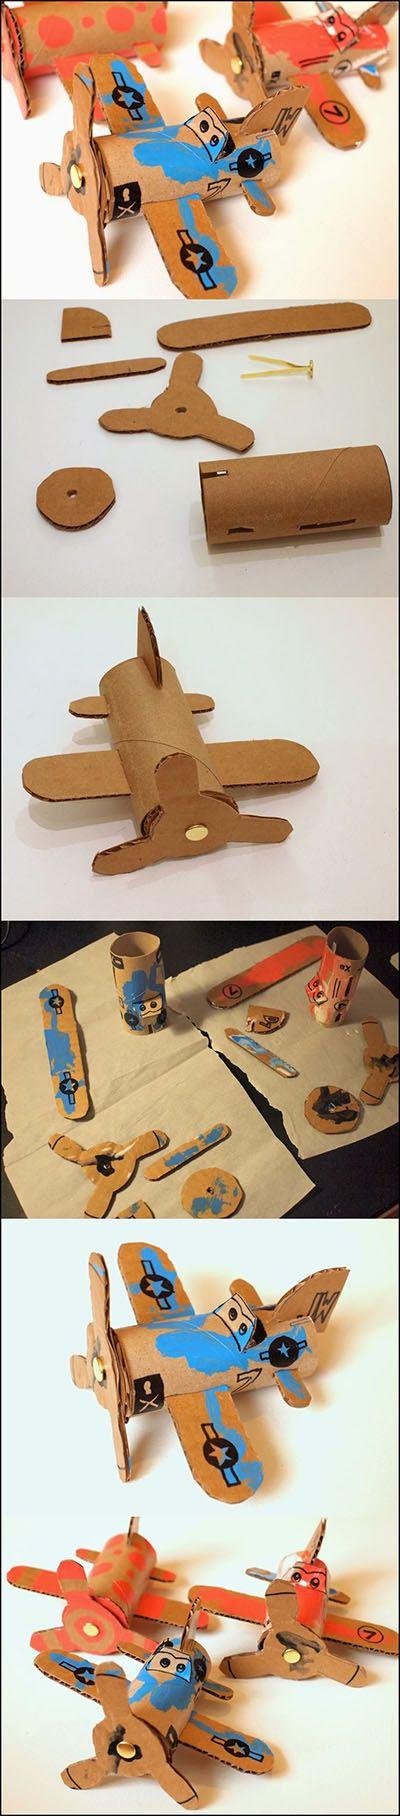 7 Wonderful DIY Toilet Roll Airplanes 644e6a8